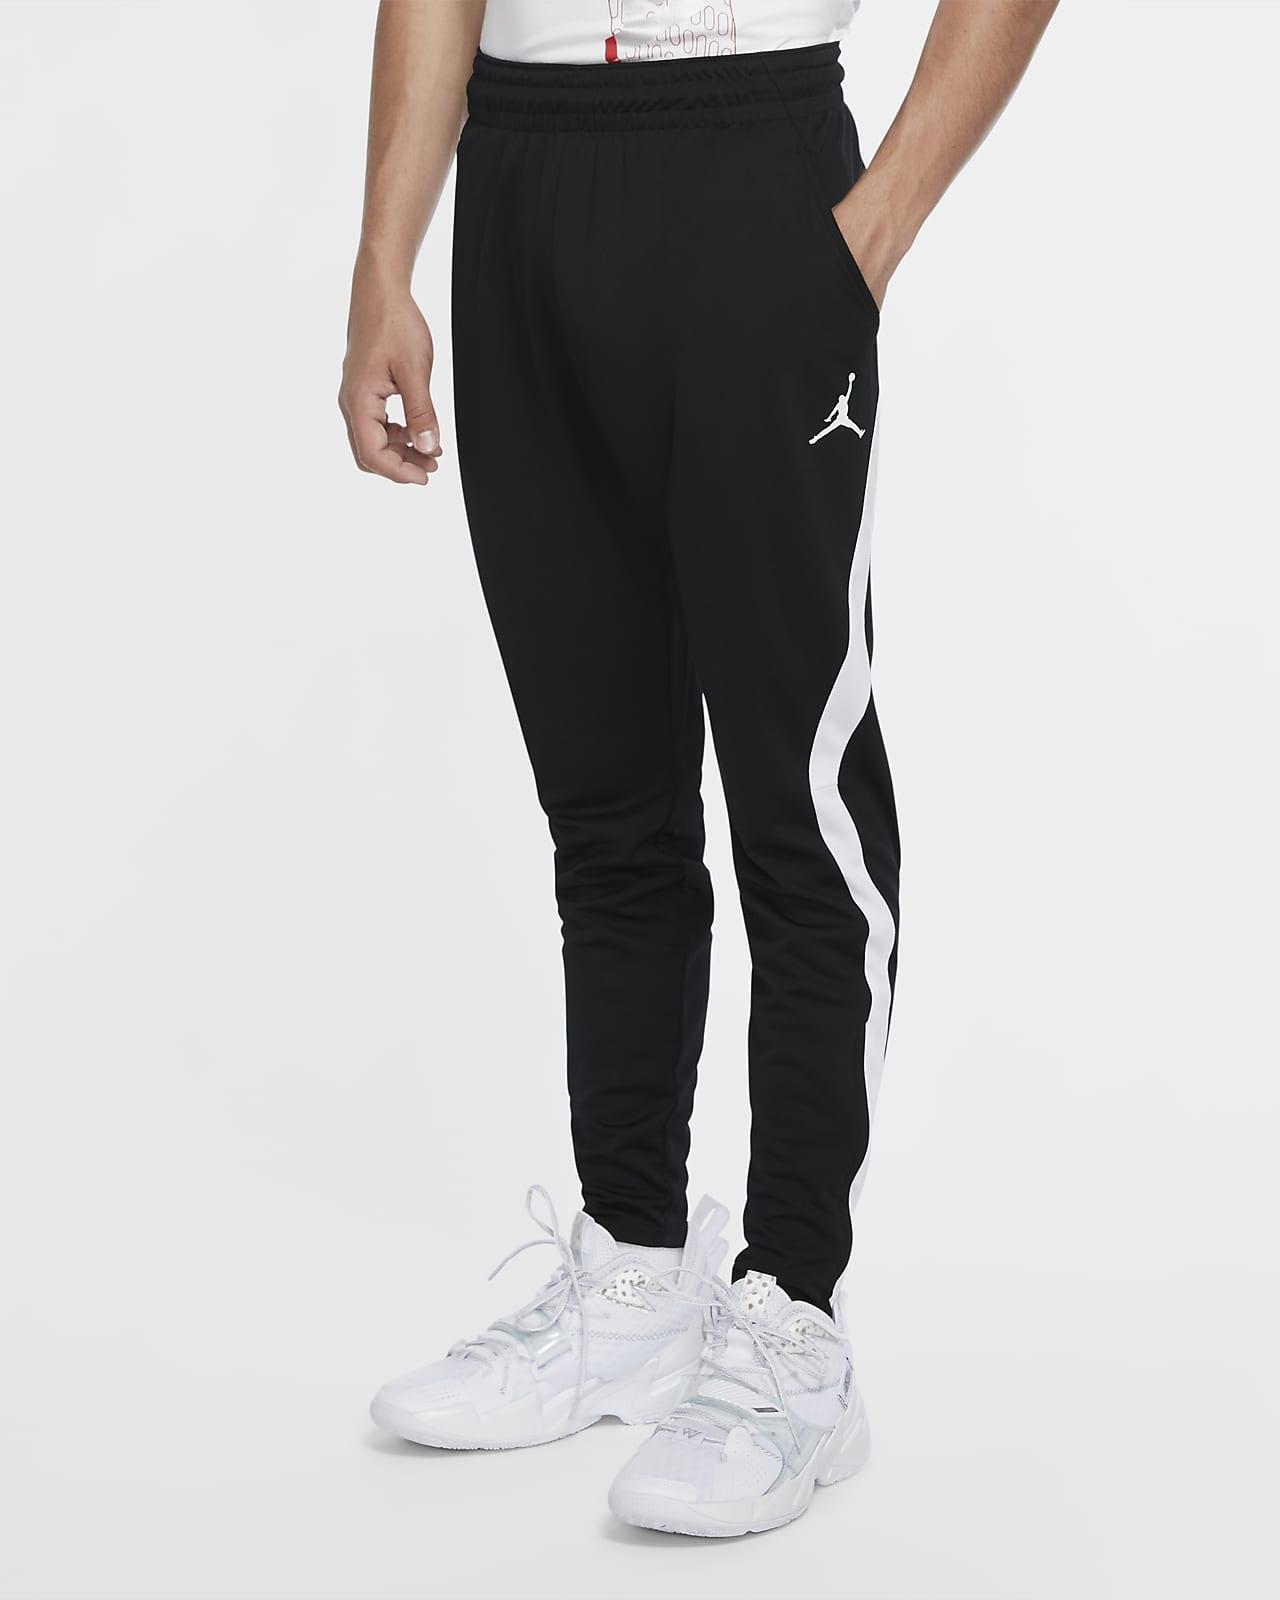 Jordan Dri-FIT Air Men's Knit Trousers